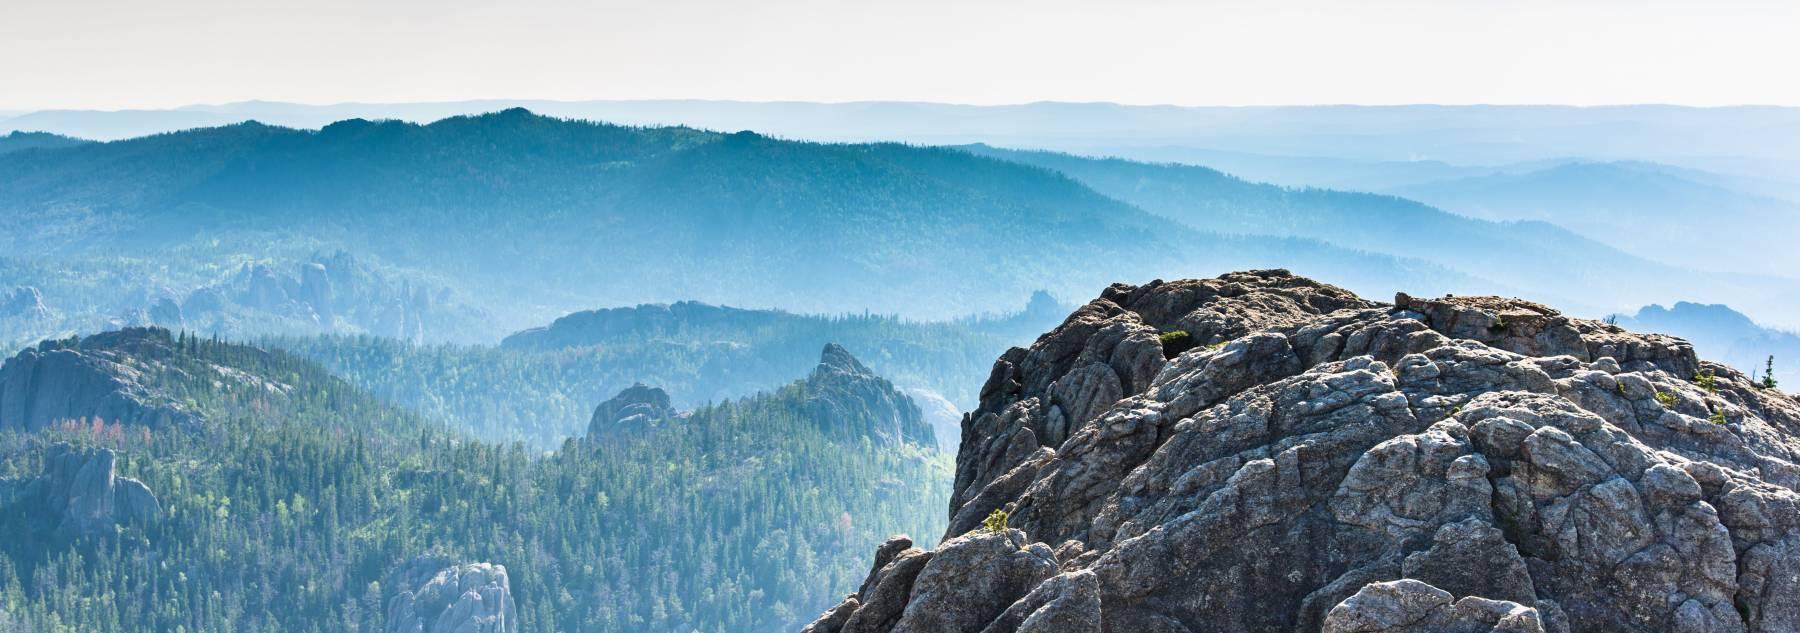 Landscape view of ponderosa pines in Black Hills National Forest